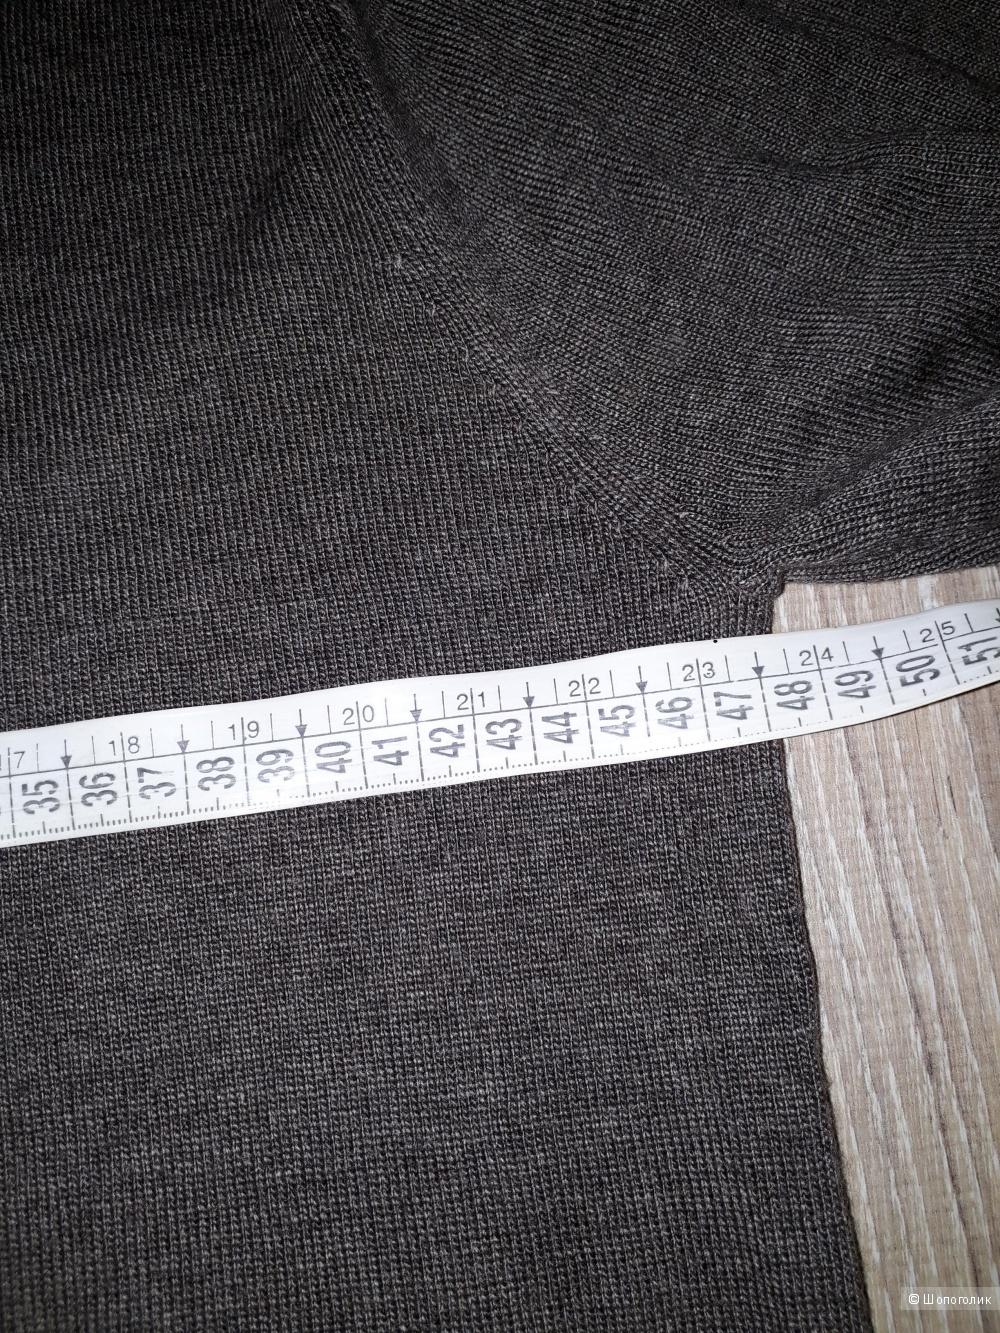 Пуловер benetton, размер 46-48